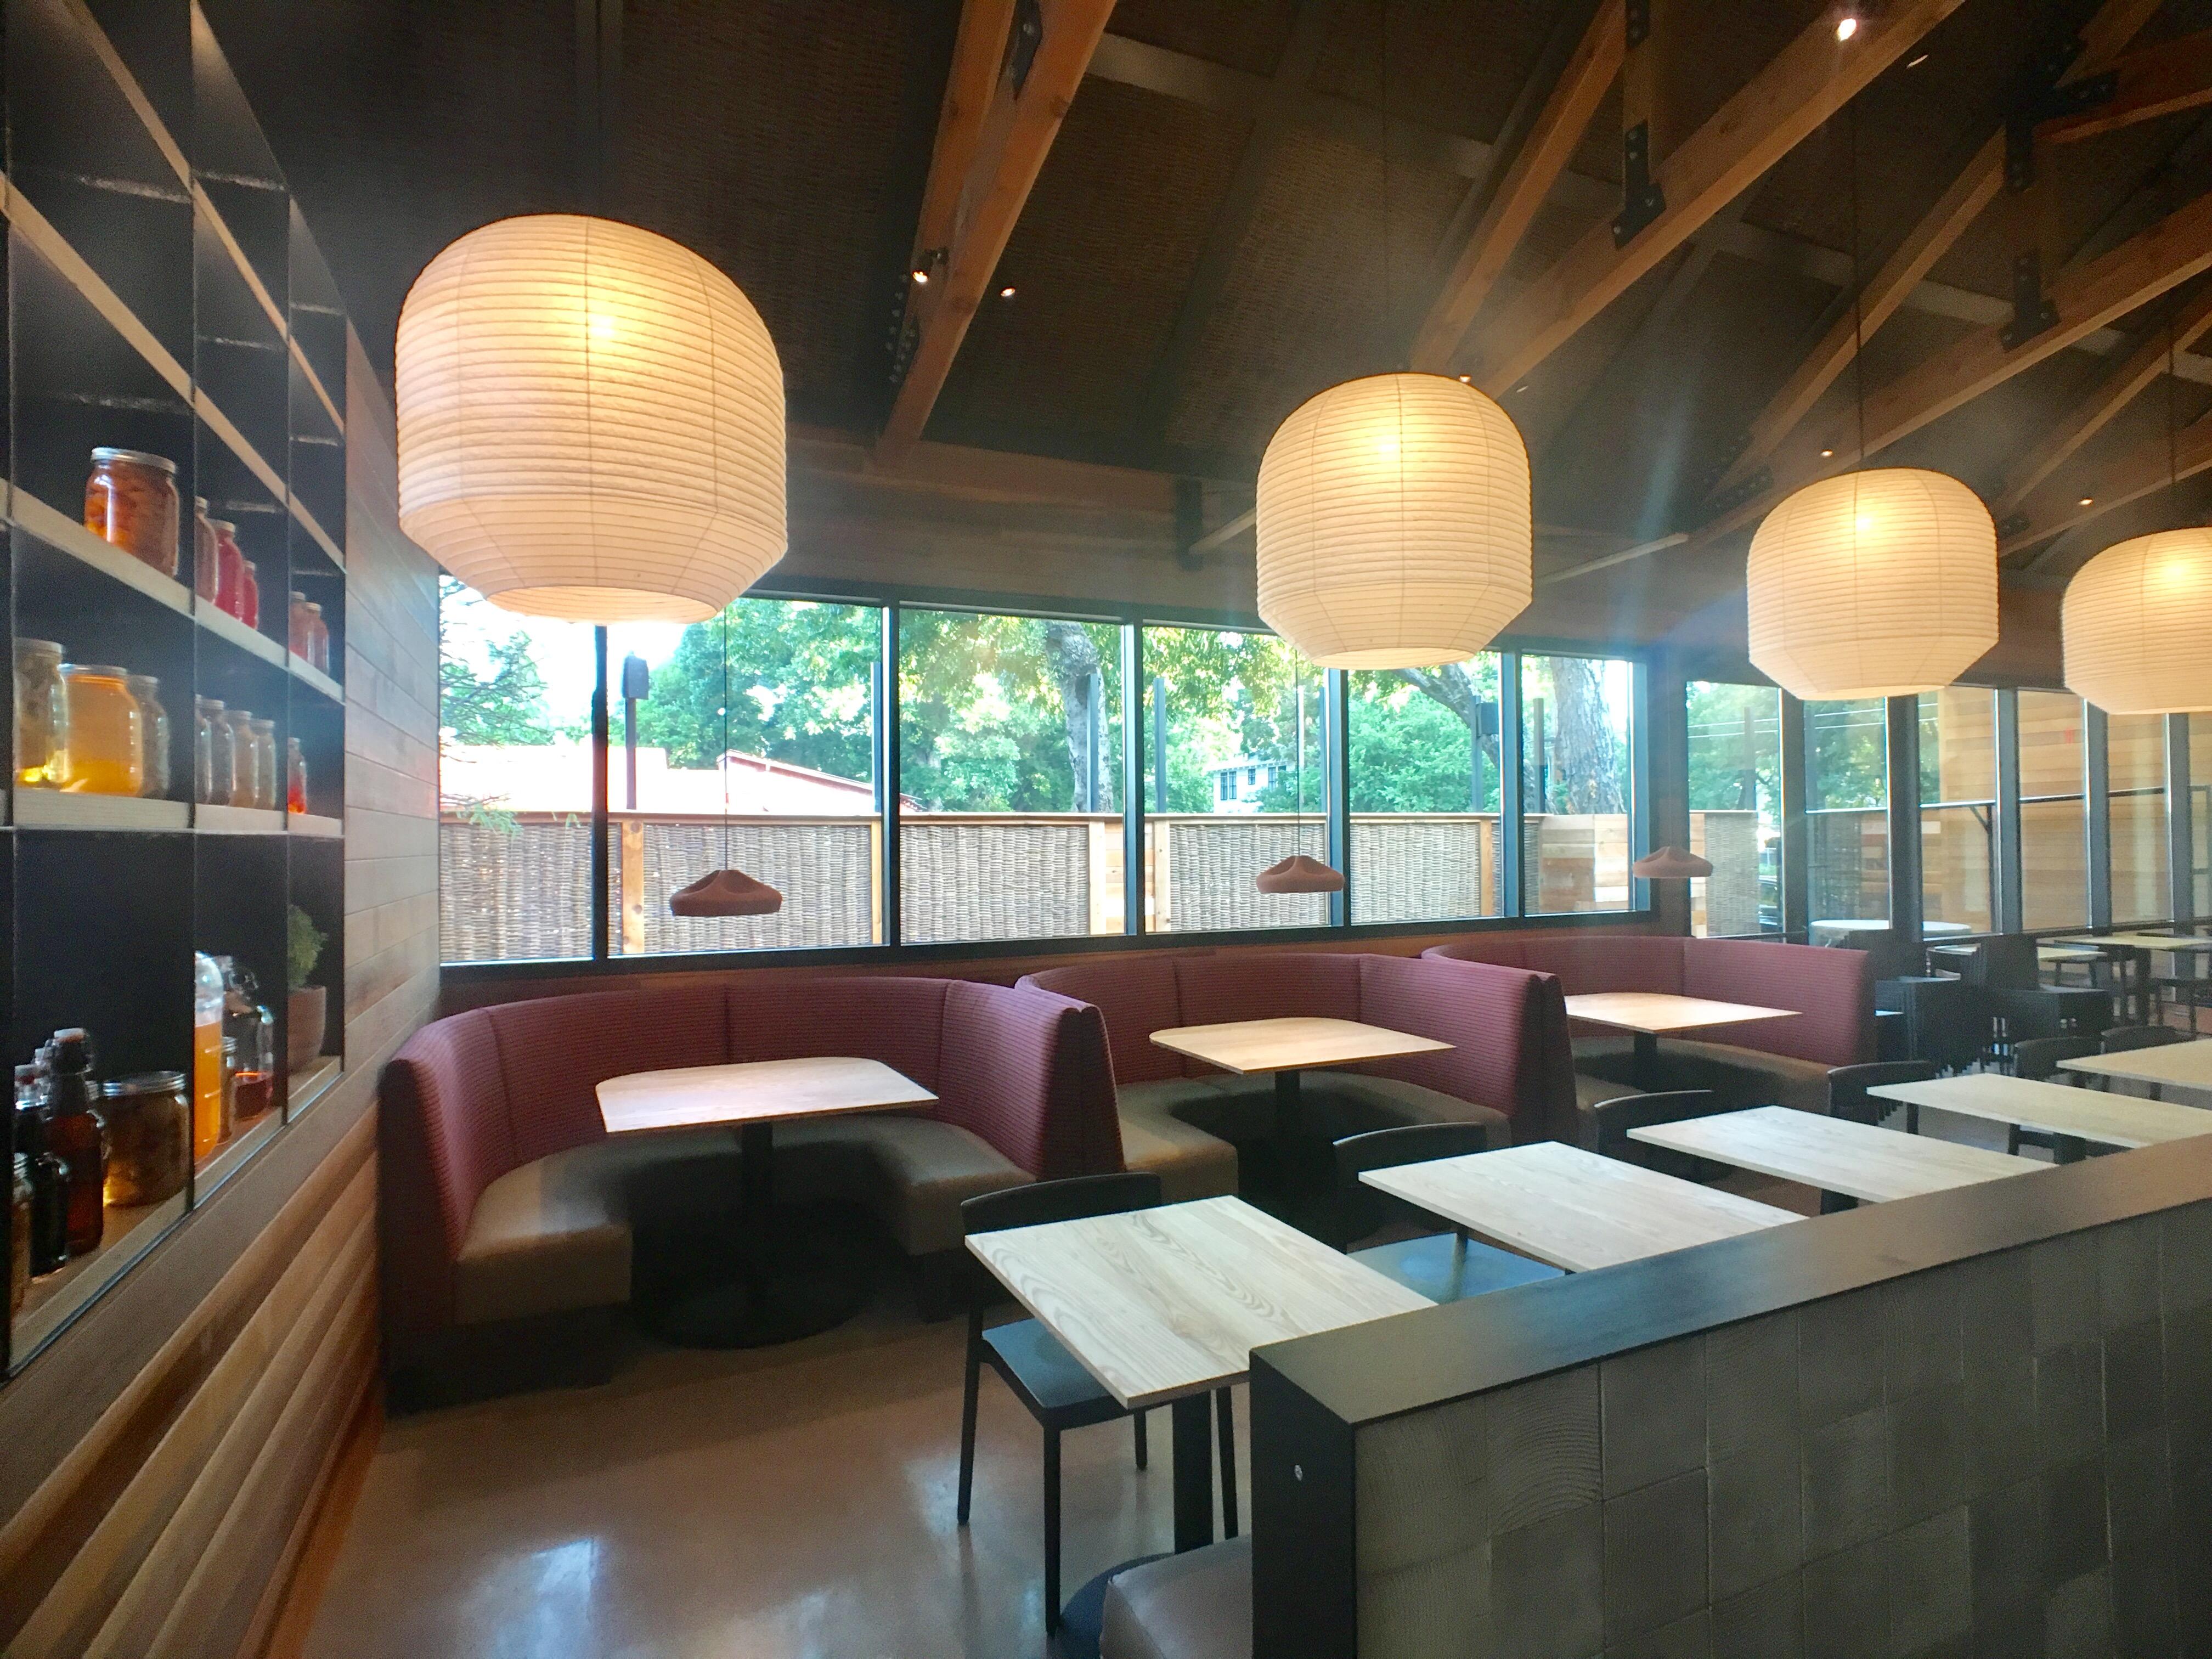 Pitchfork Pretty dining room